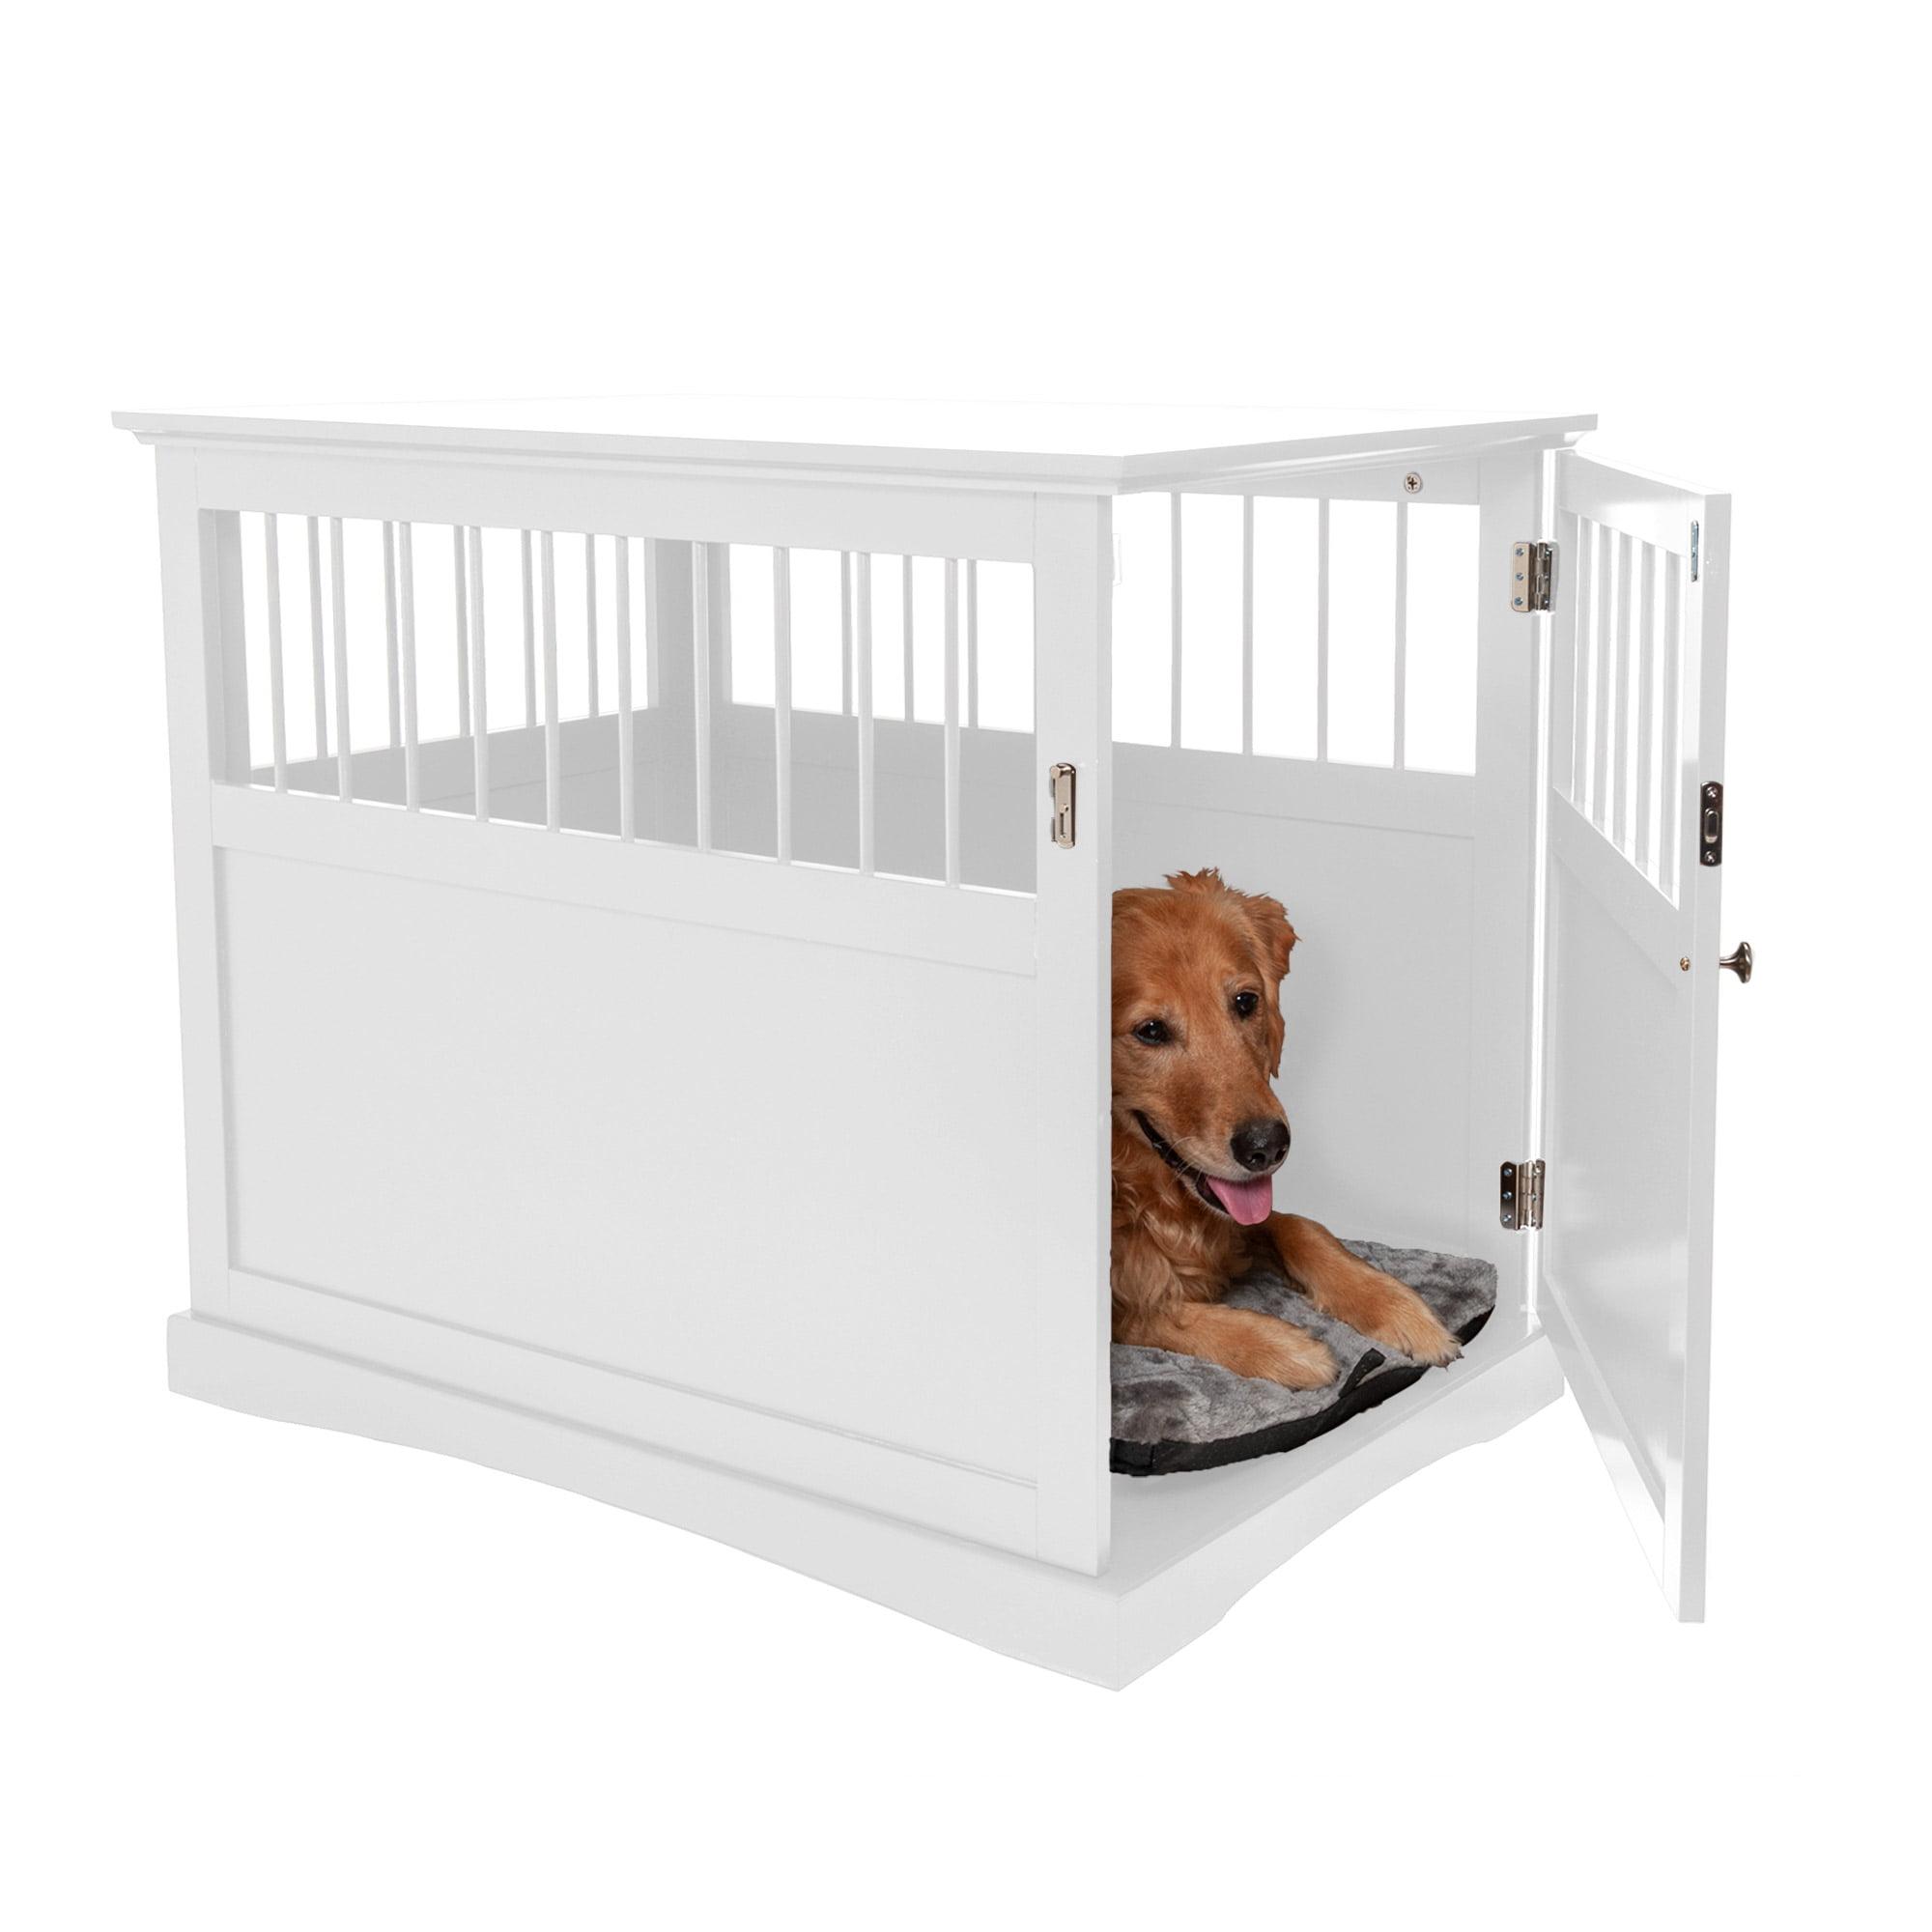 Furhaven Pet Dog Furniture End Table Dog Crate White